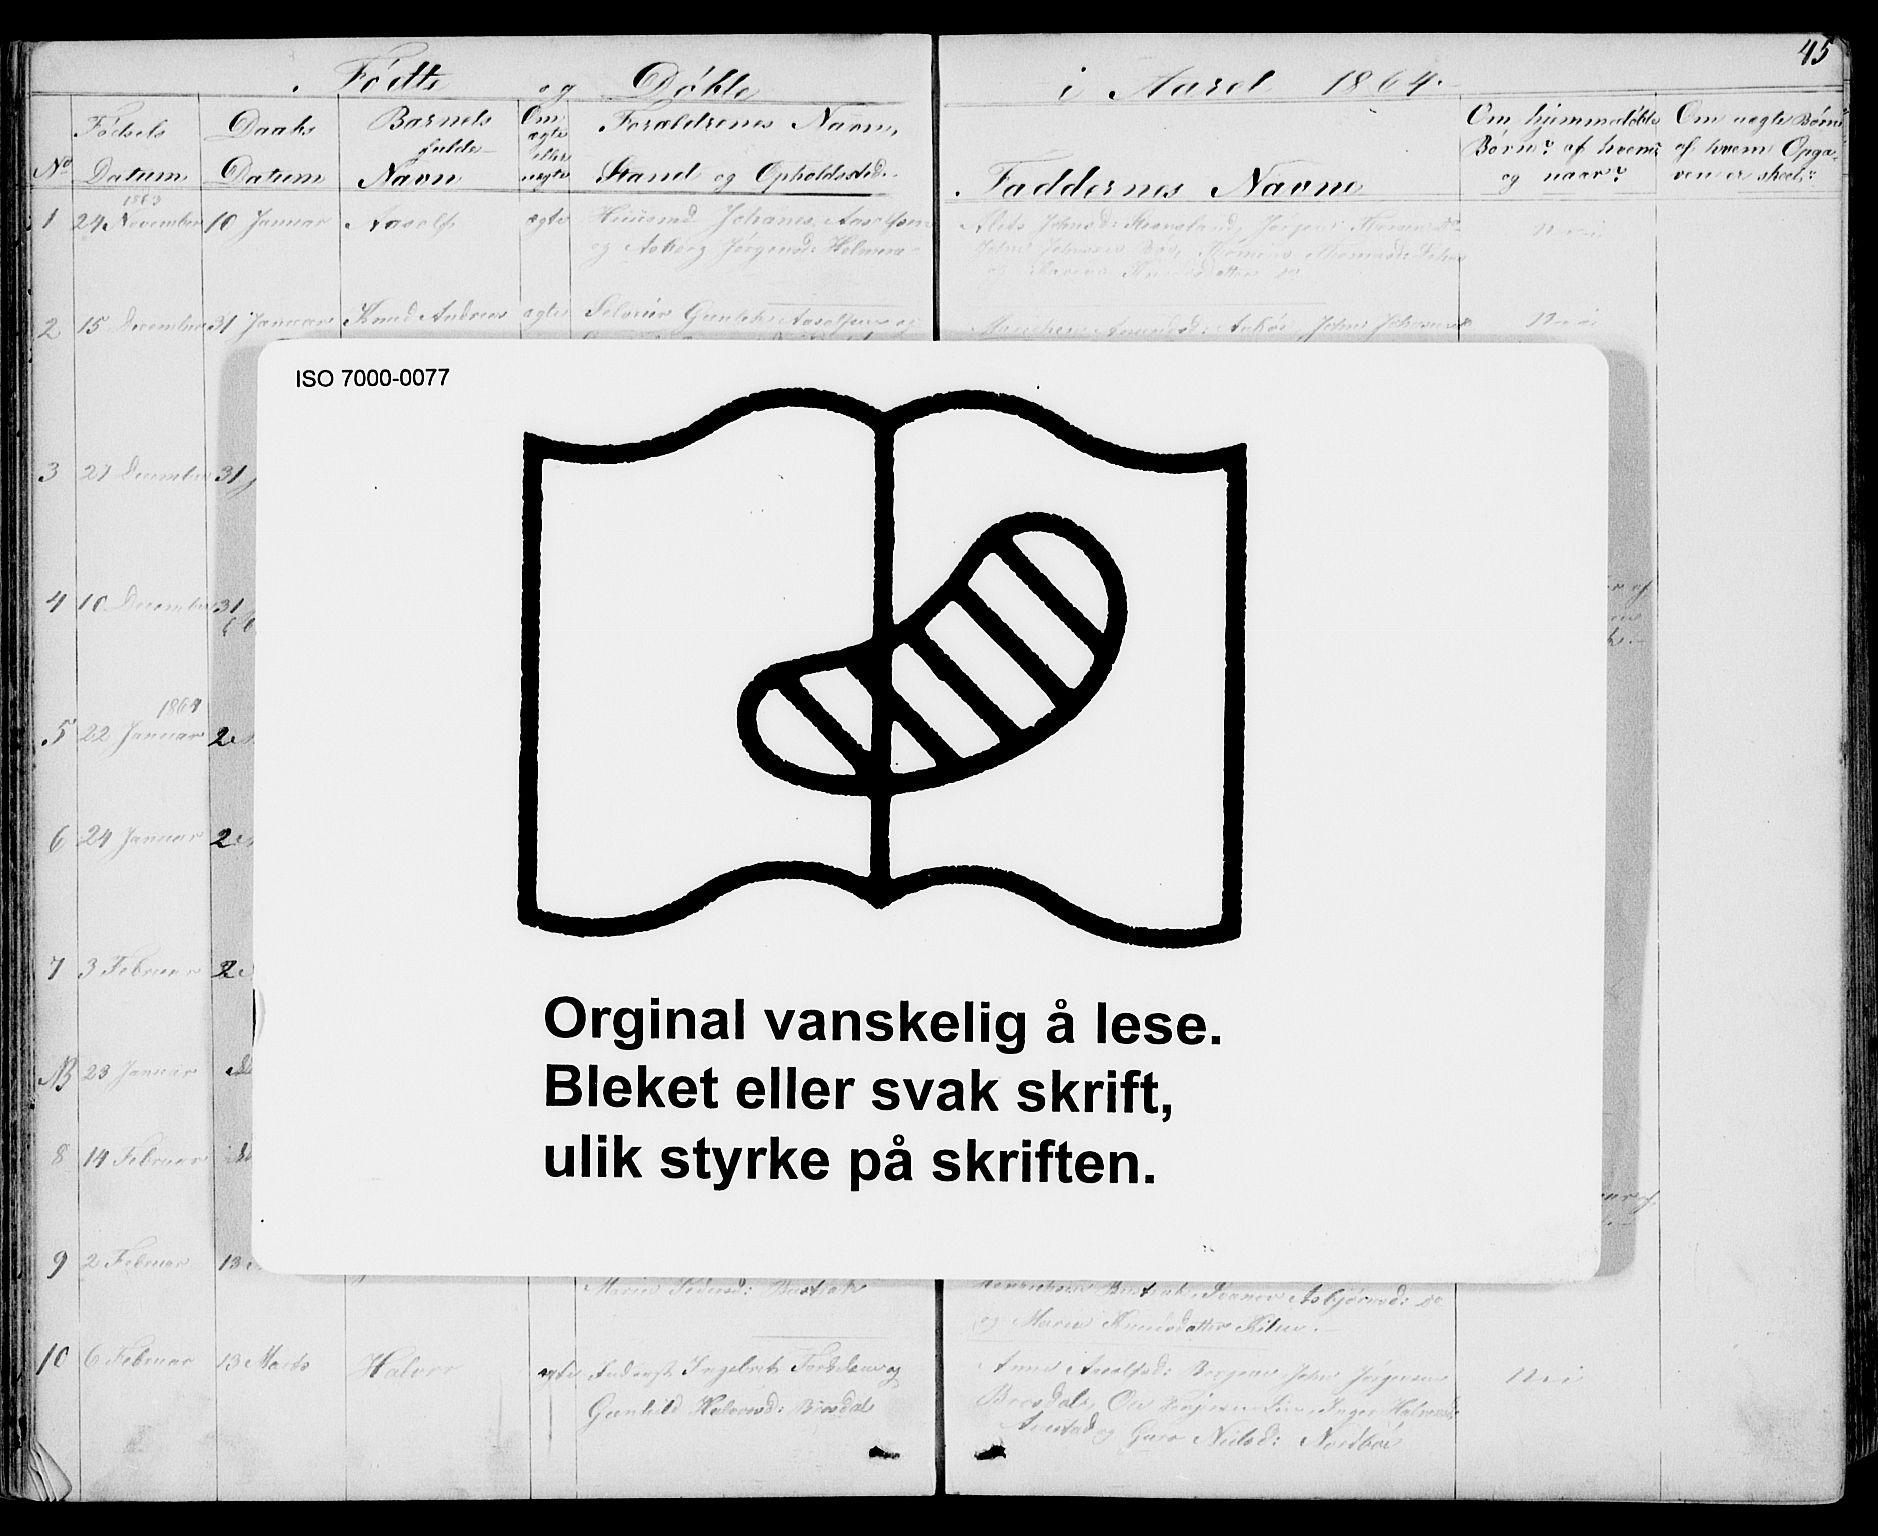 SAKO, Drangedal kirkebøker, G/Gb/L0001: Klokkerbok nr. II 1, 1856-1894, s. 45